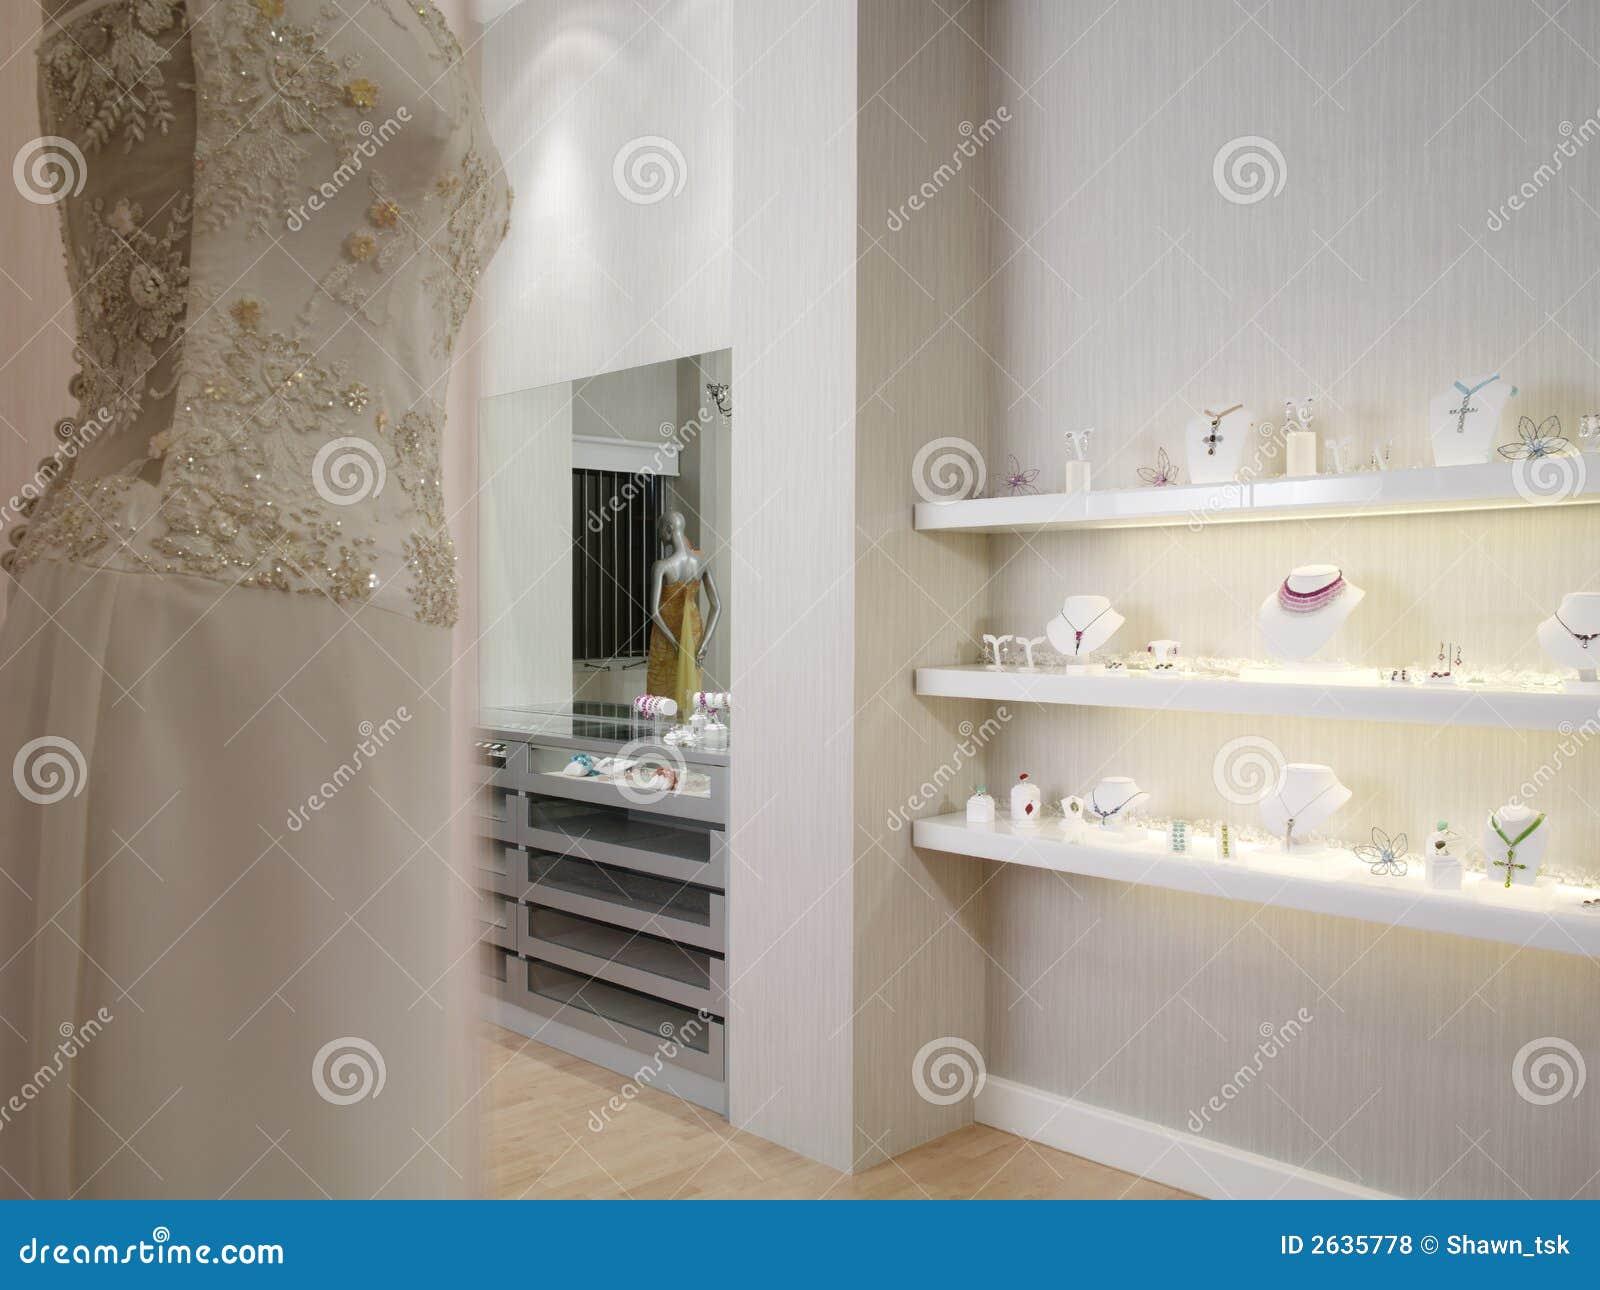 Bridal store business plan